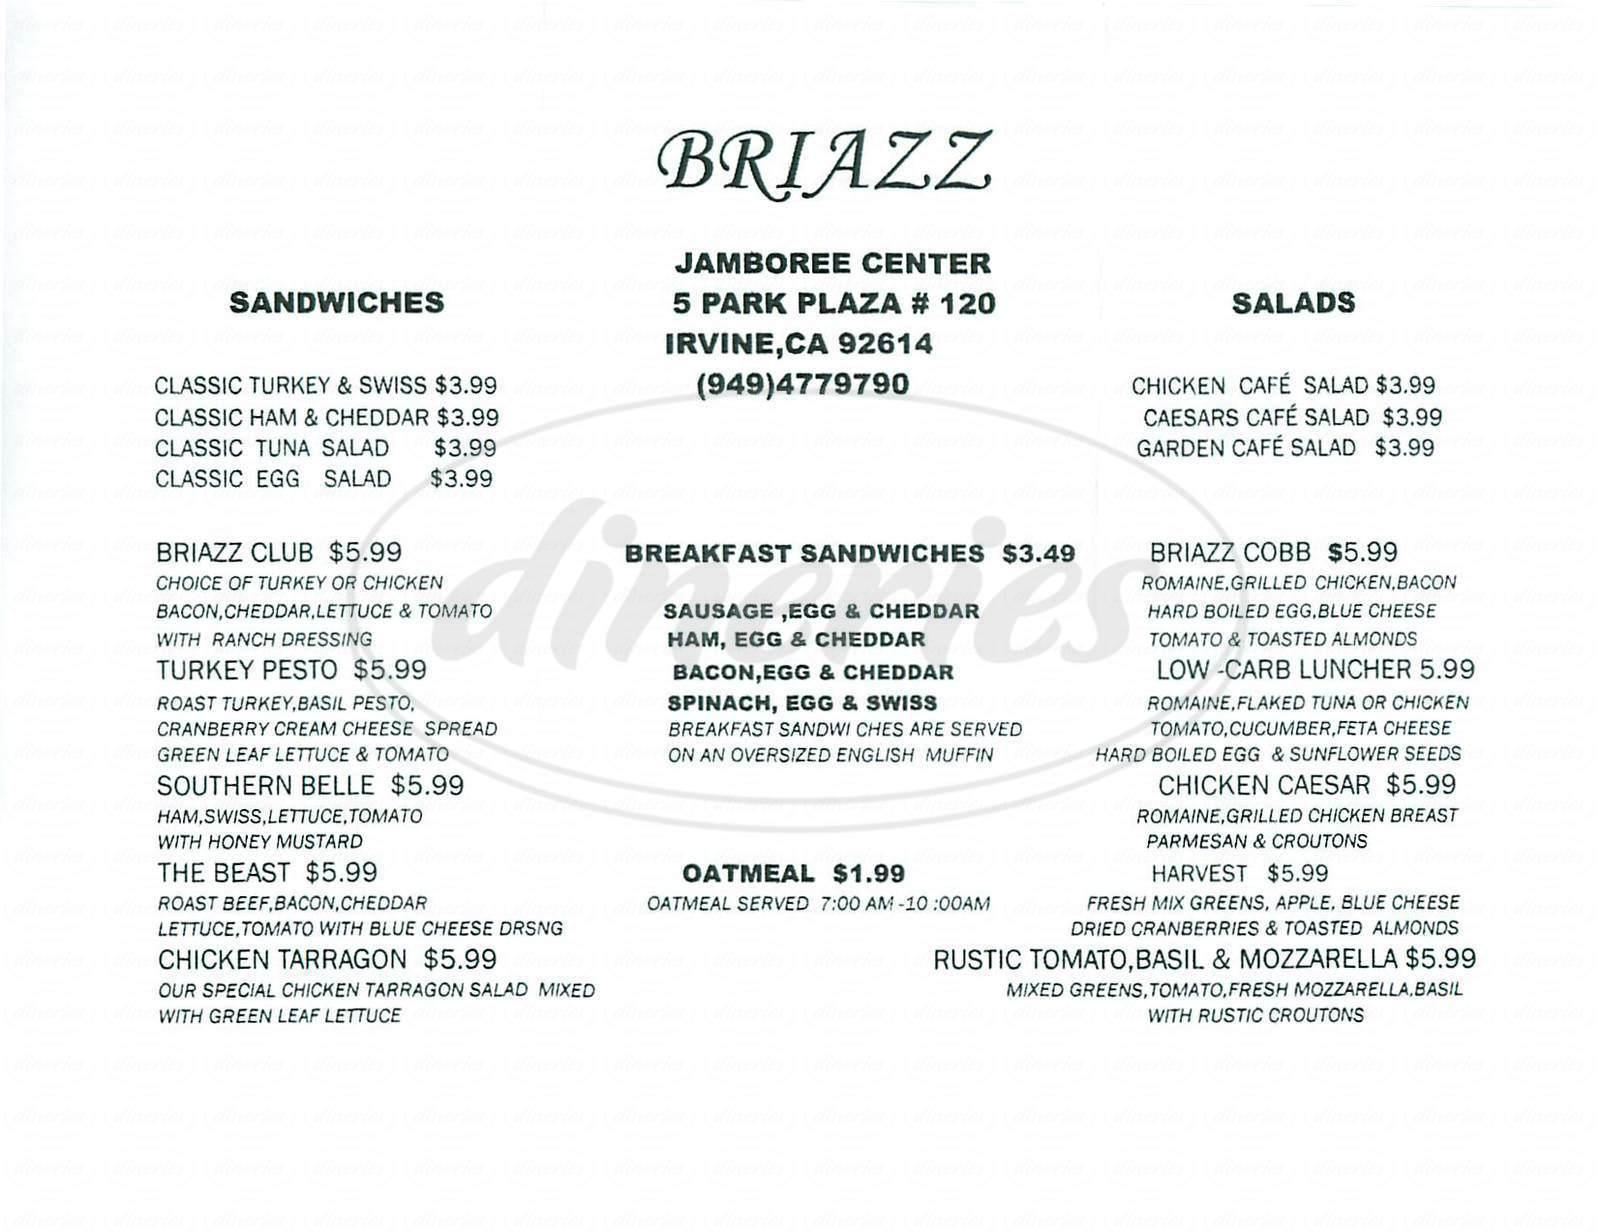 menu for Briazz